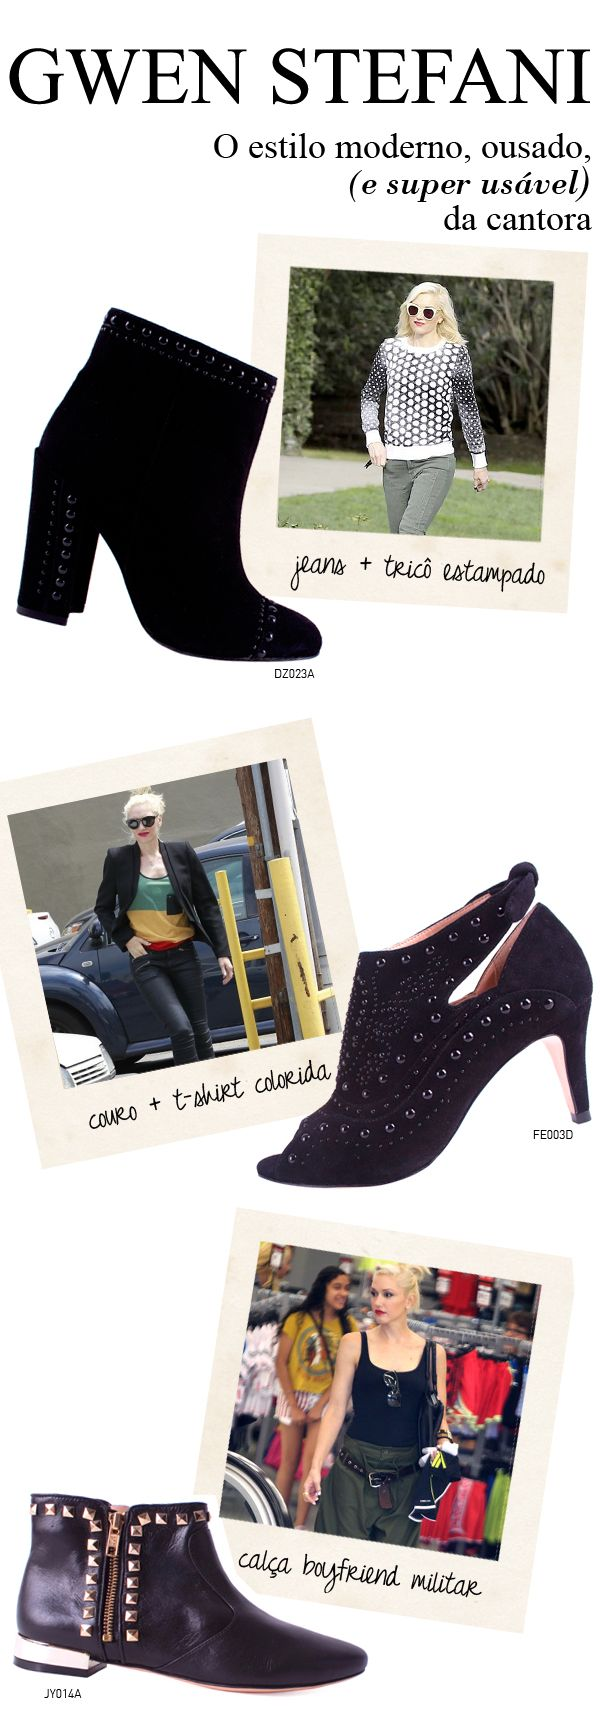 Guia de estilo: Gwen Stefani